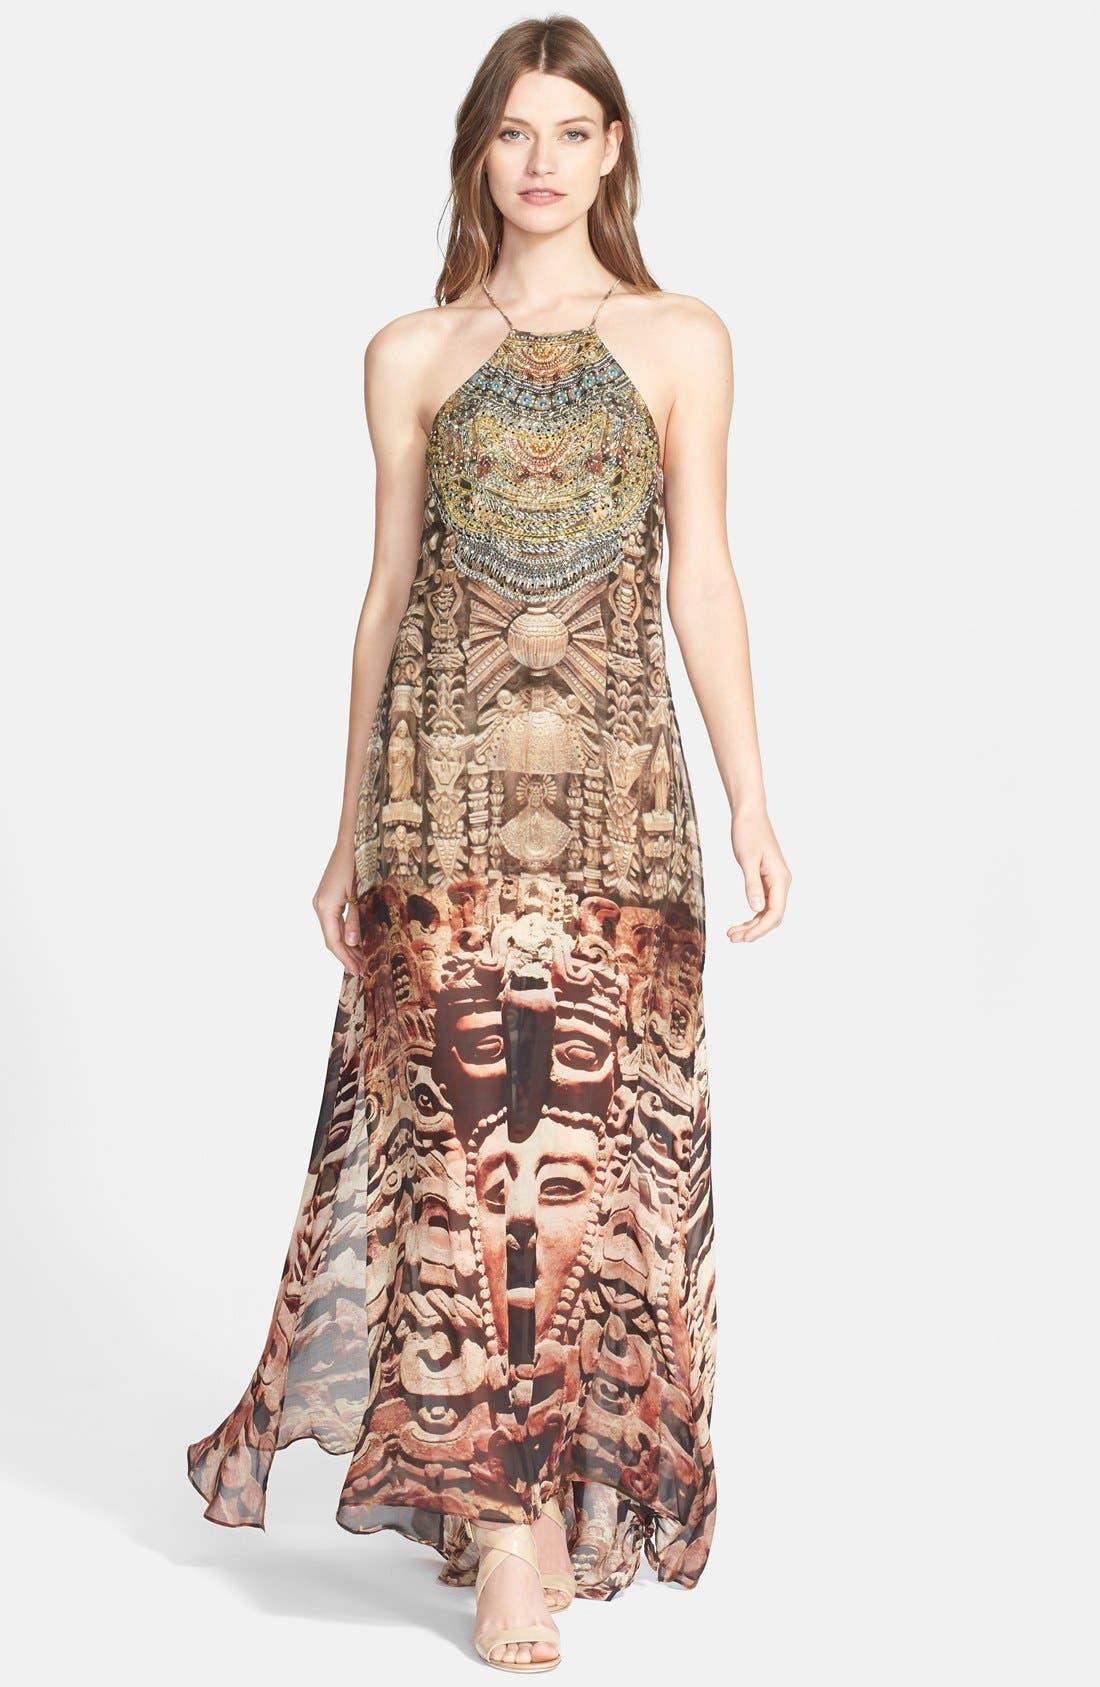 Main Image - Camilla 'Time Among the Gods' Crystal Embellished Print Silk Maxi Dress